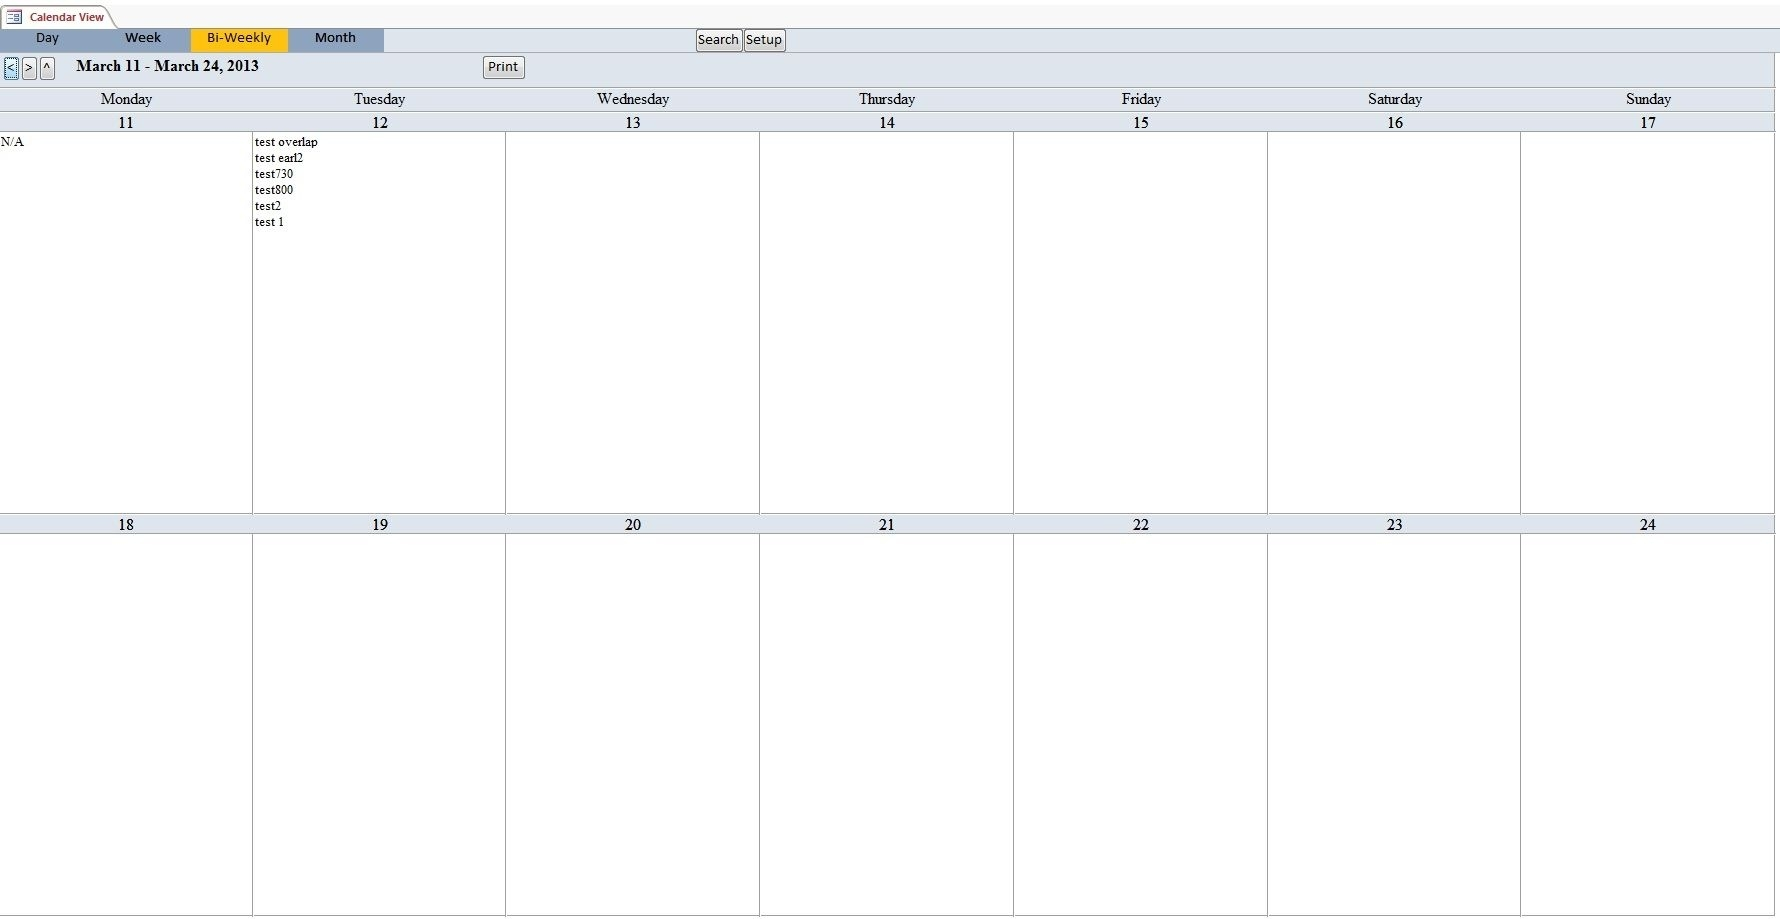 Bi-Weekly+Calendar+Template | Excel Calendar Template Calendar Template Week View